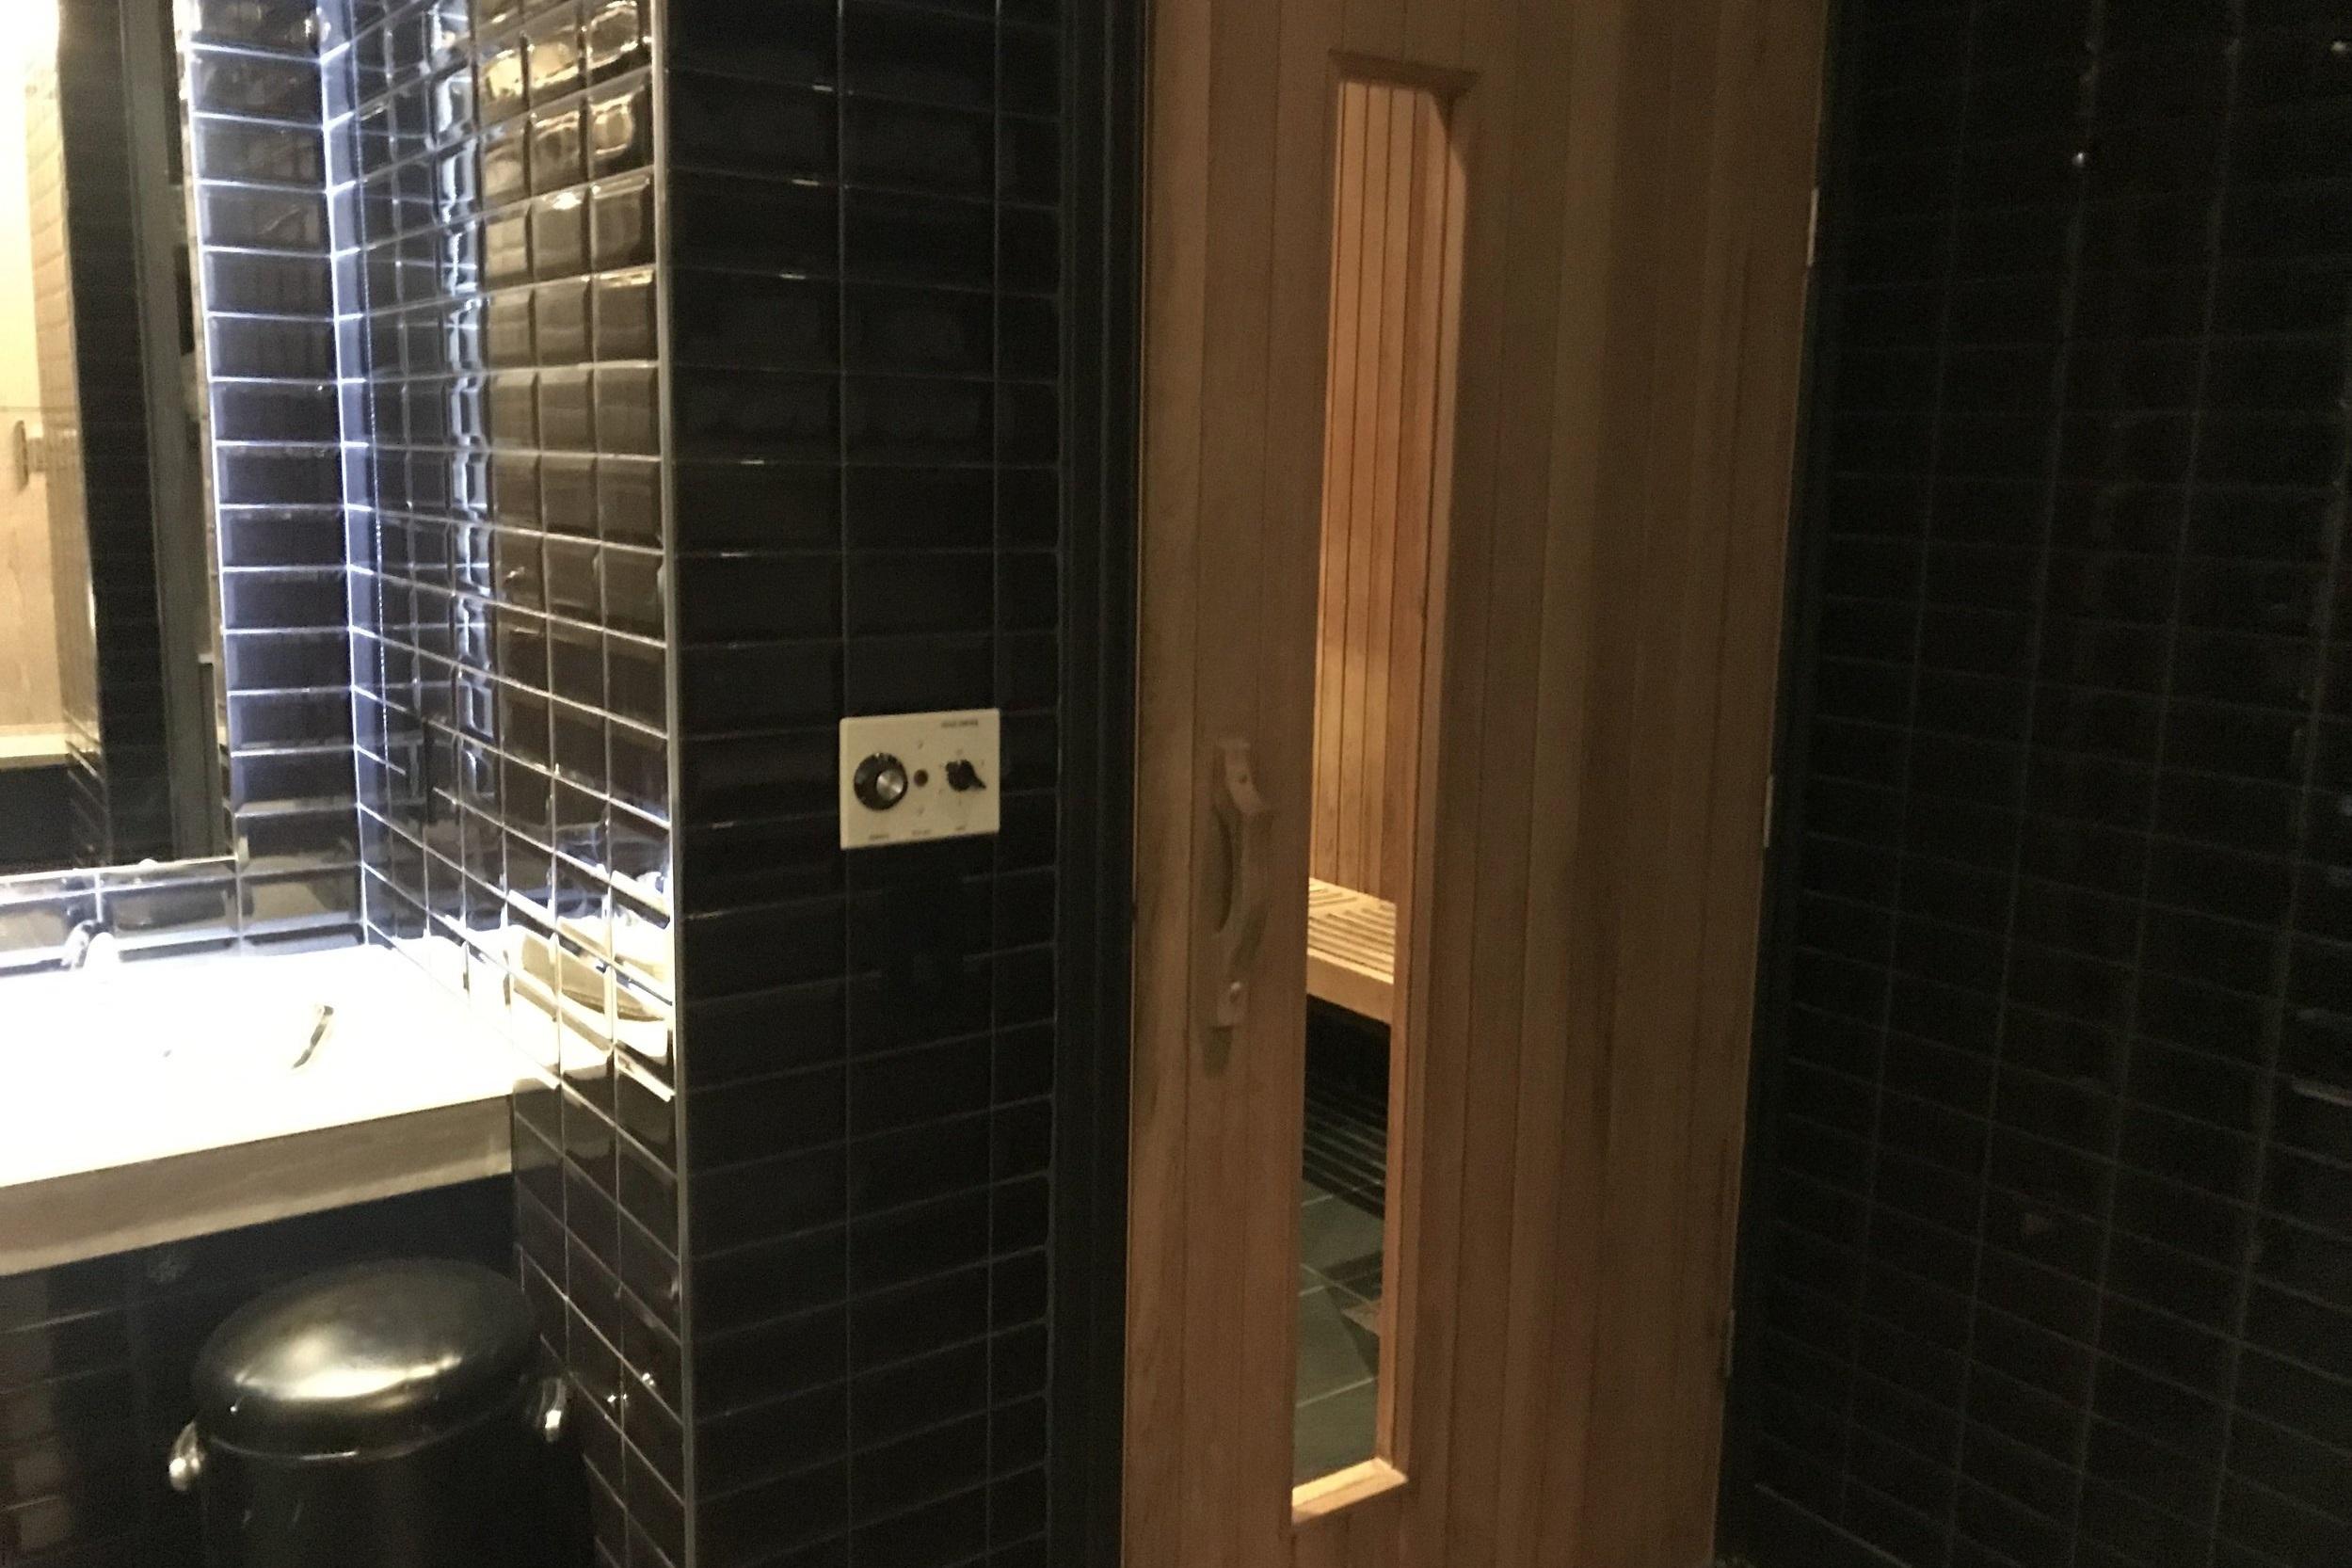 St. Regis Toronto – Changing room sauna